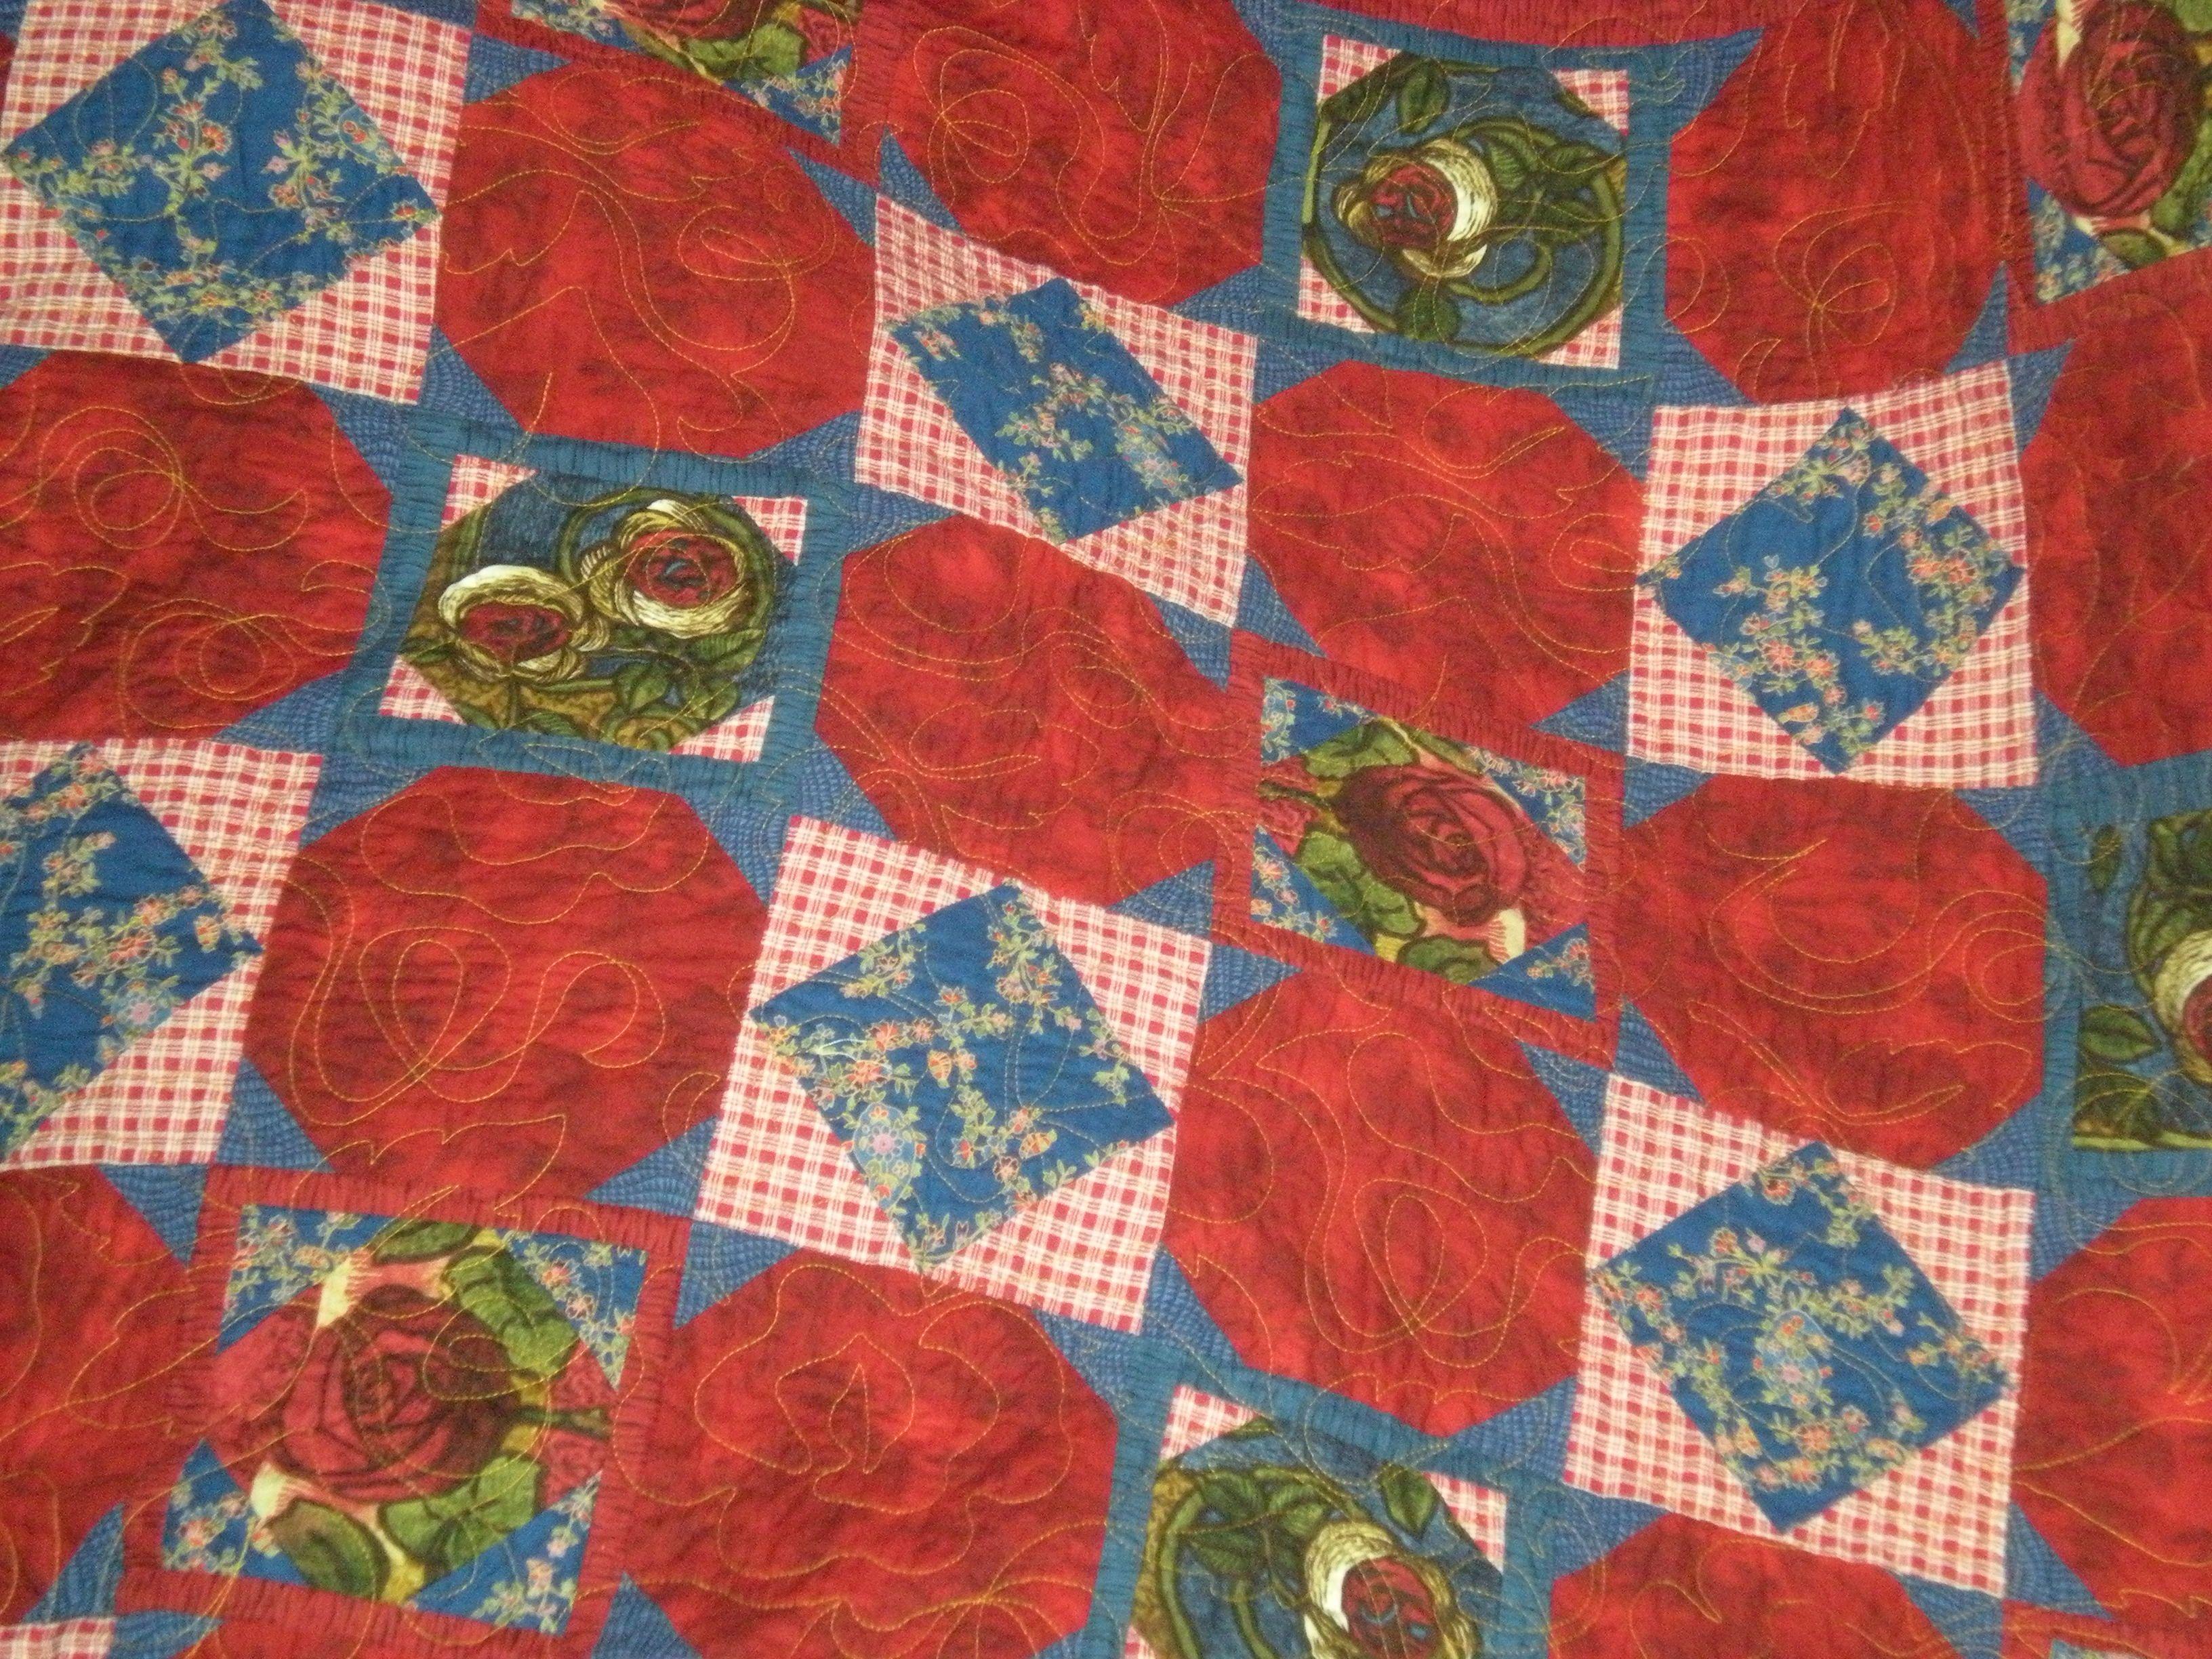 Made for Lauren 2007 Made by Cheryl@skrunchbucket.com email:cheryl@skrunchbucket.com